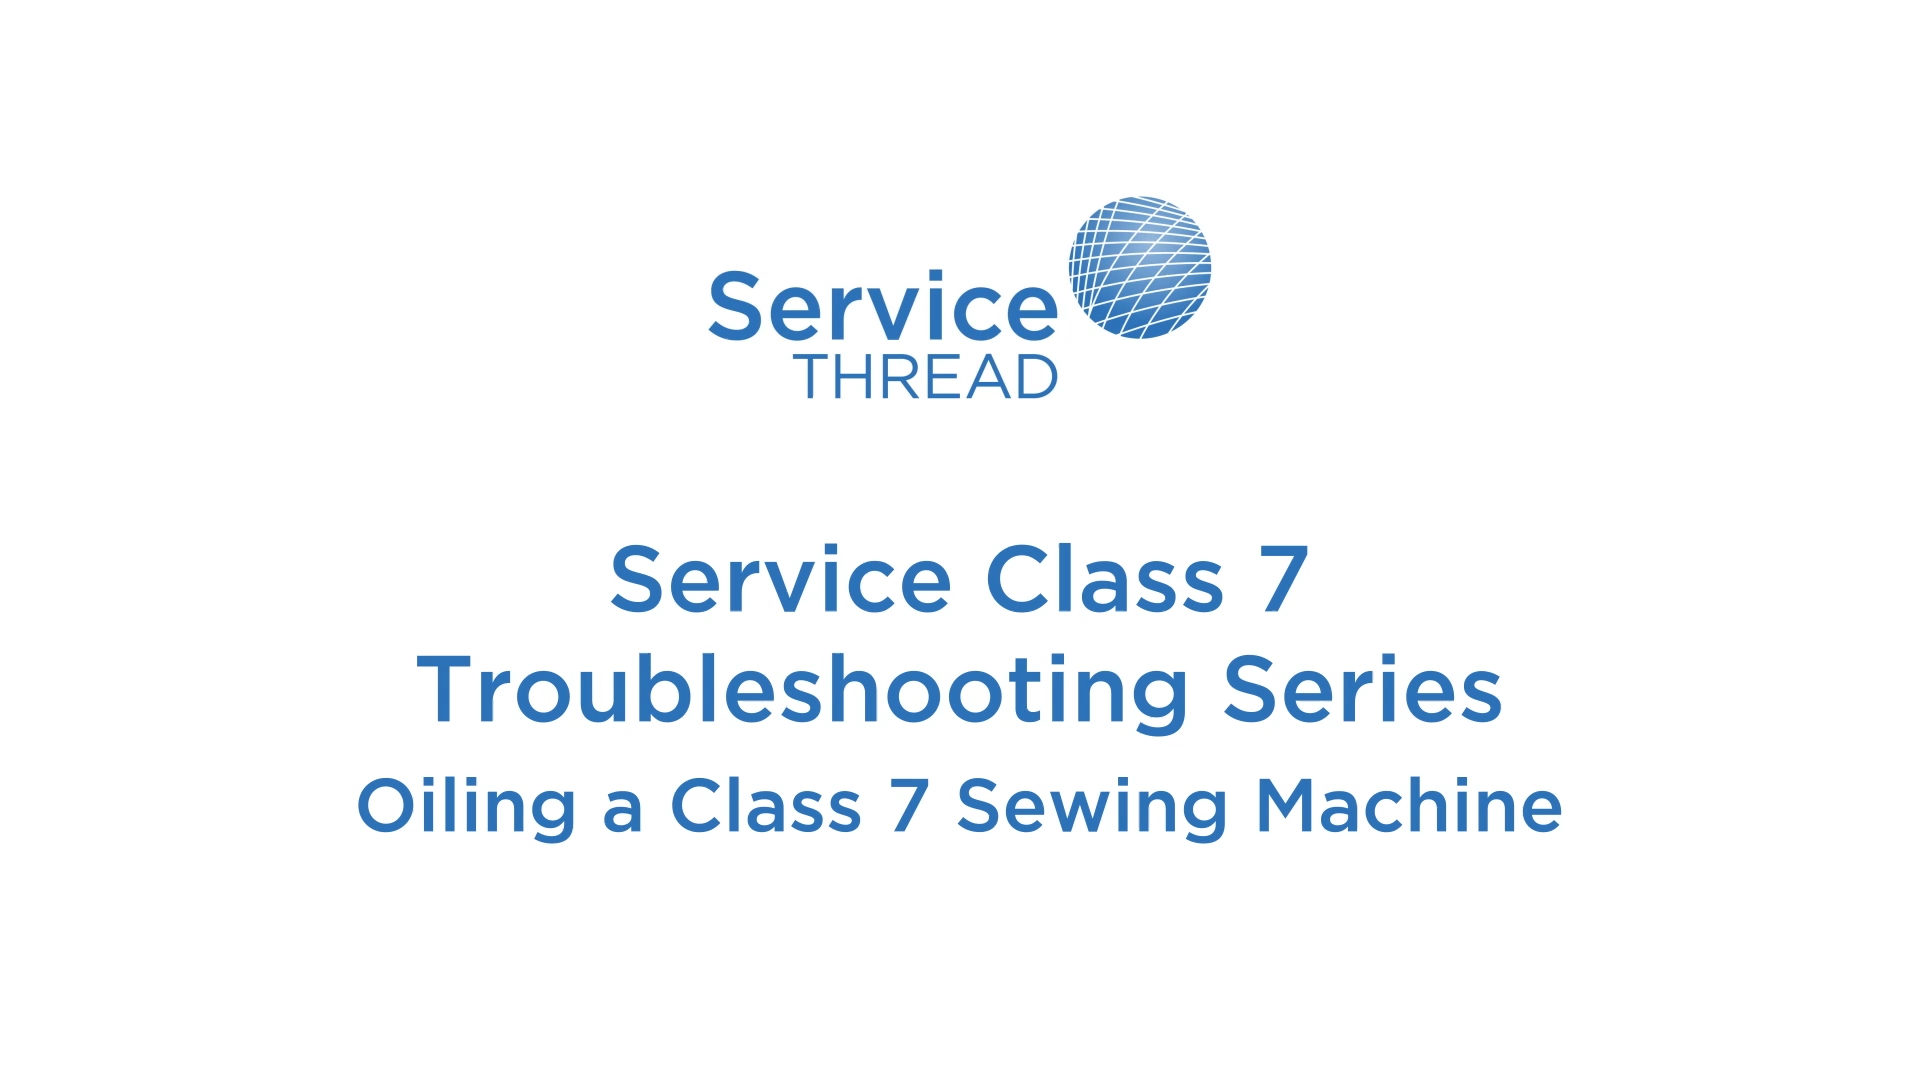 Oiling a Class 7 Sewing Machine